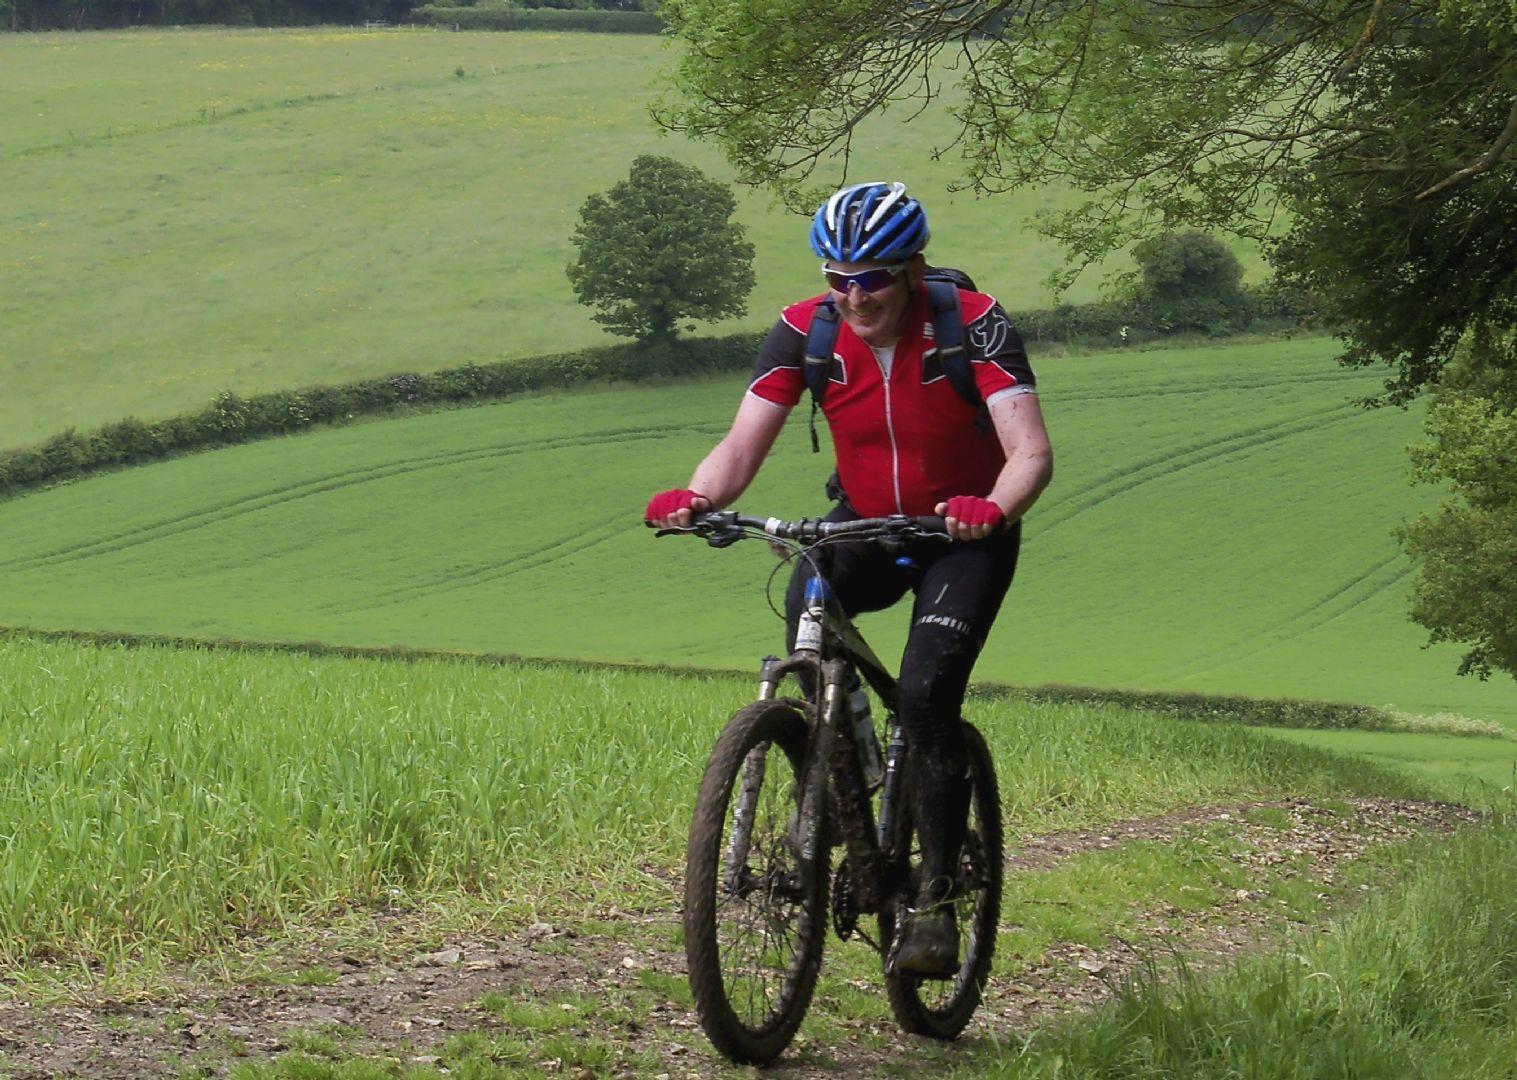 chilternsintro4.jpg - UK - Chilterns - Guided Mountain Bike Weekend - Mountain Biking